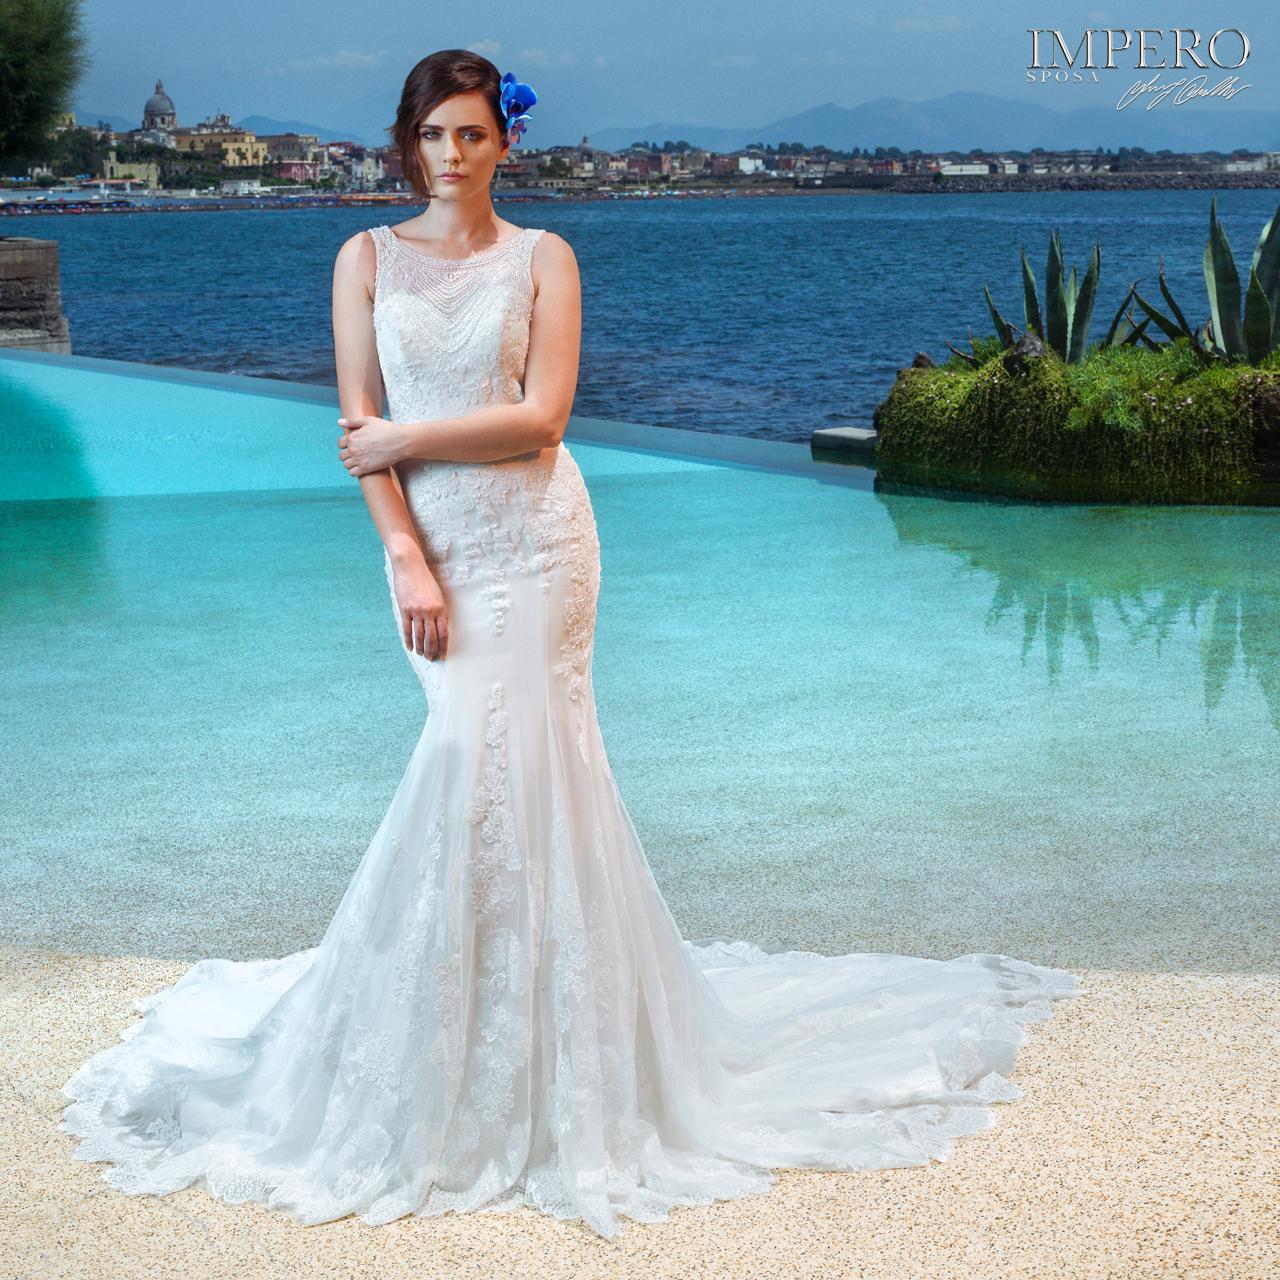 Vestido de novia, Impero Couture mod. Martina - La Novia | Todo lo ...